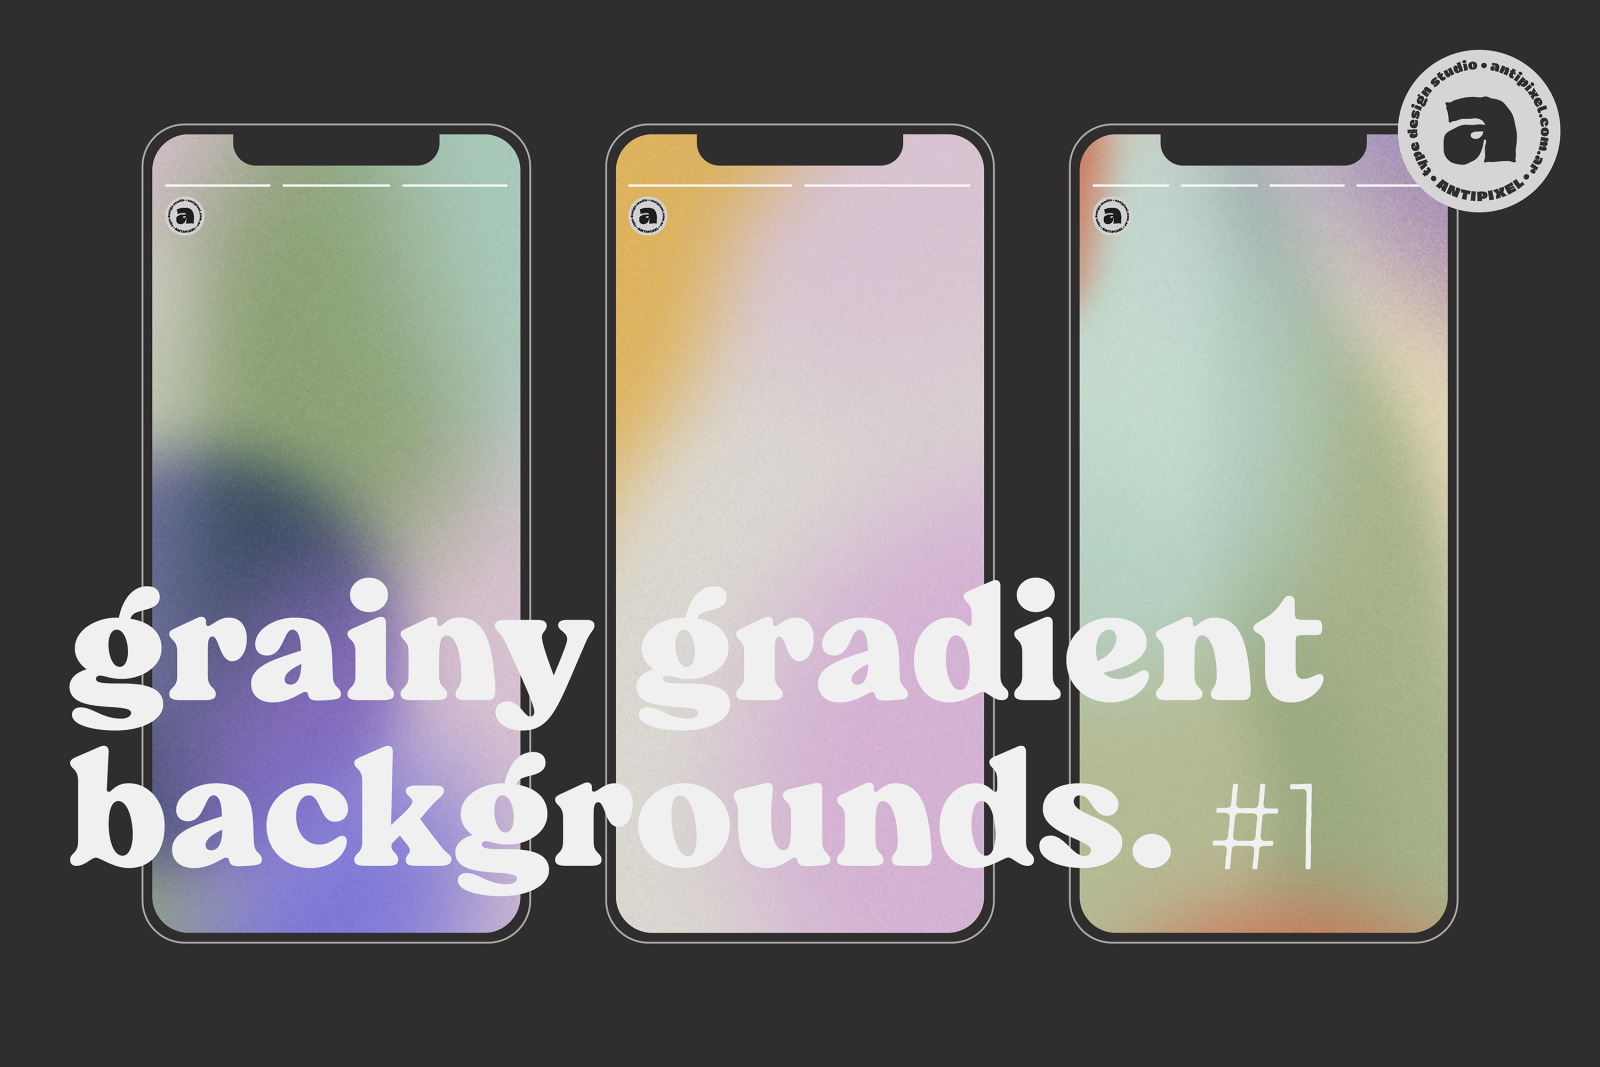 Grainy Gradient Backgrounds #1